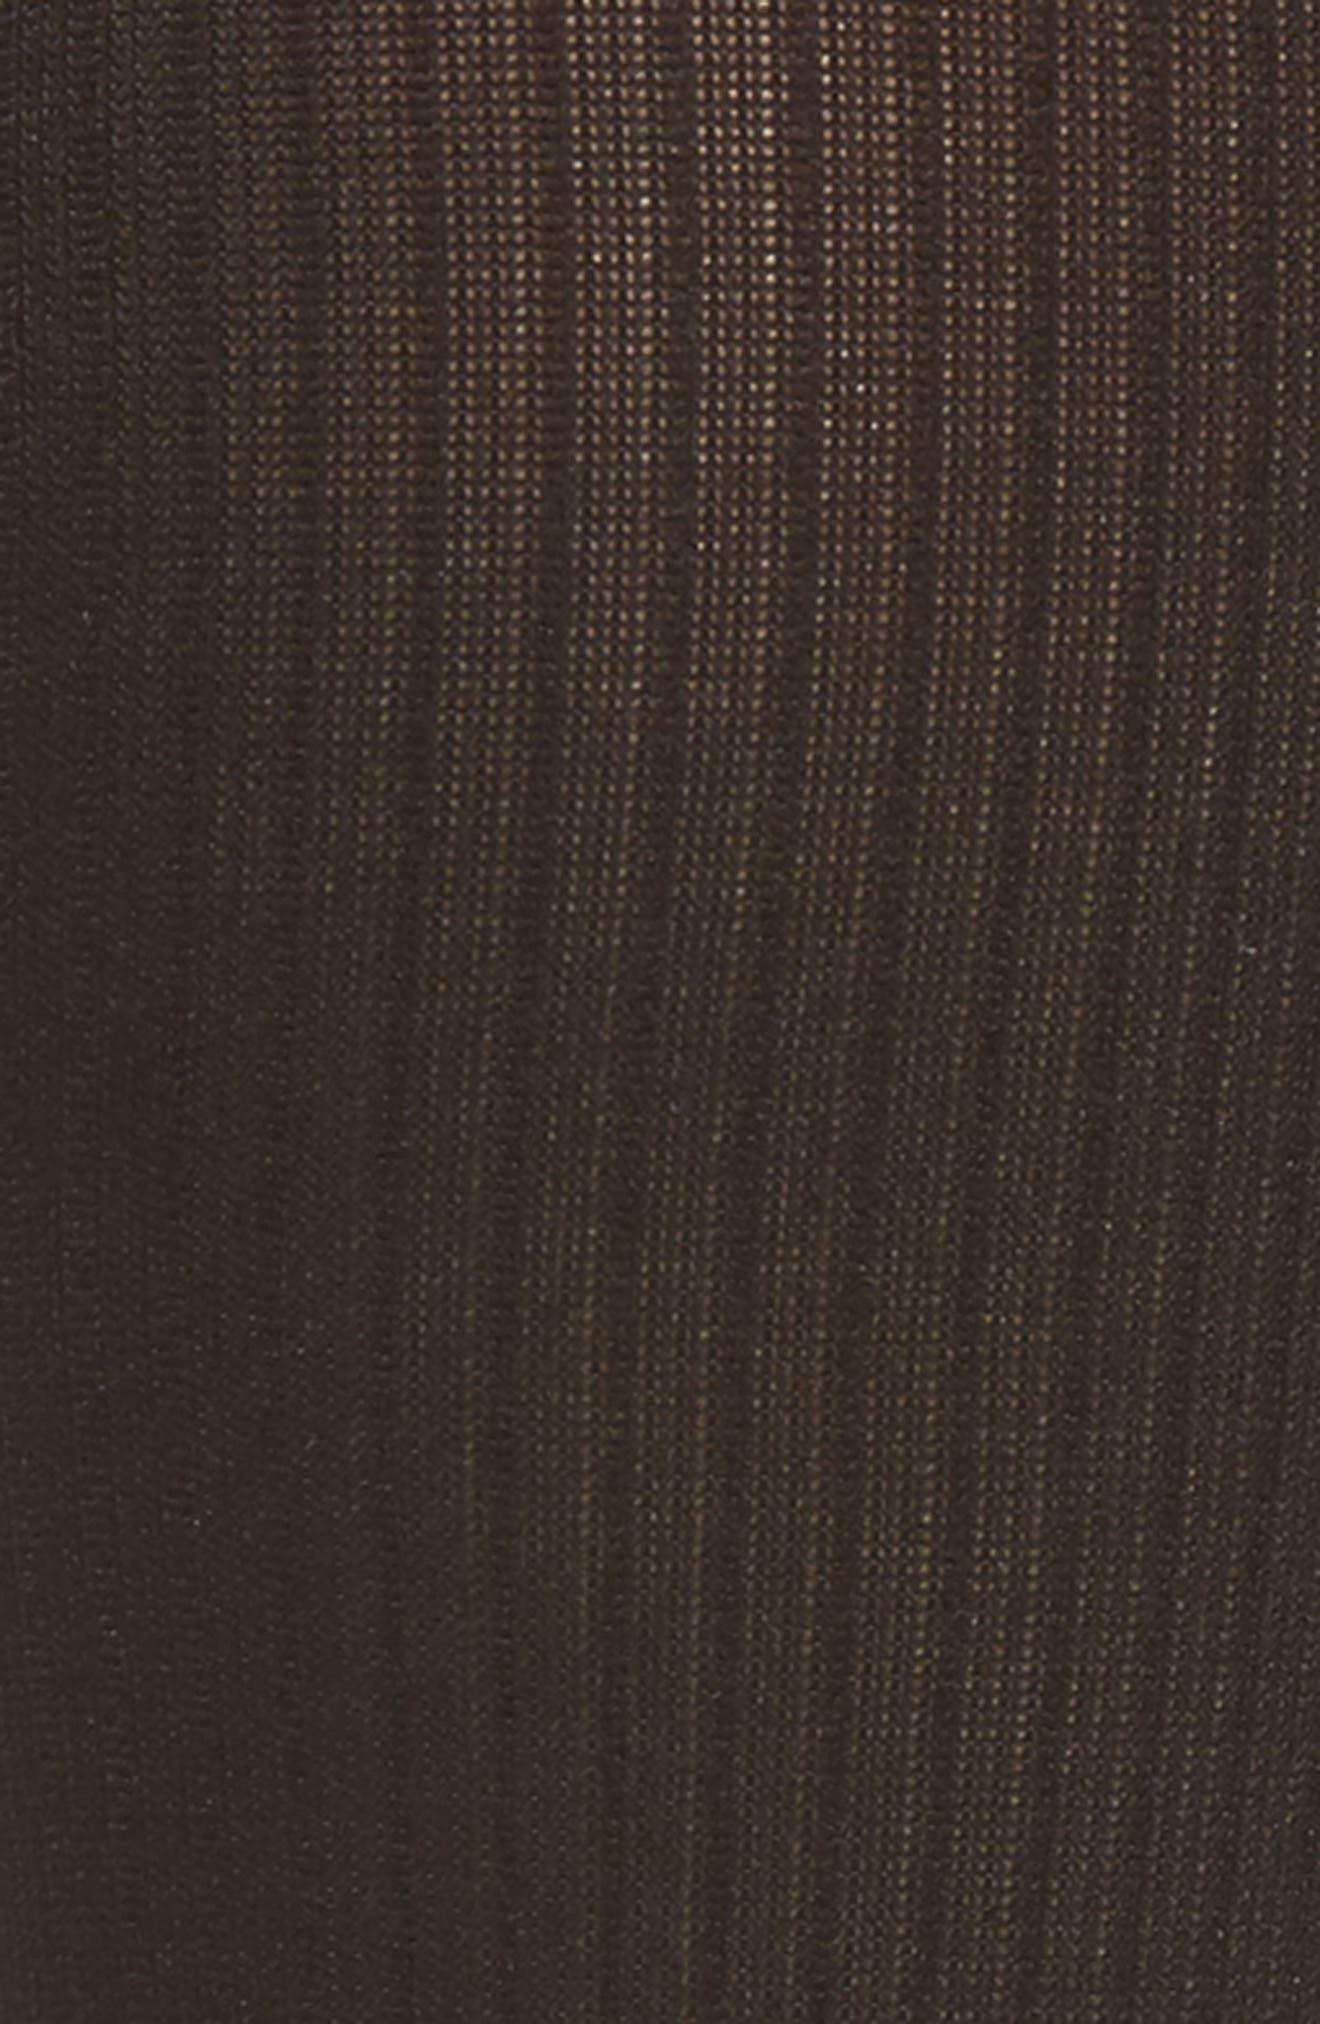 Ribbed Compression Trouser Socks,                             Alternate thumbnail 2, color,                             BLACK